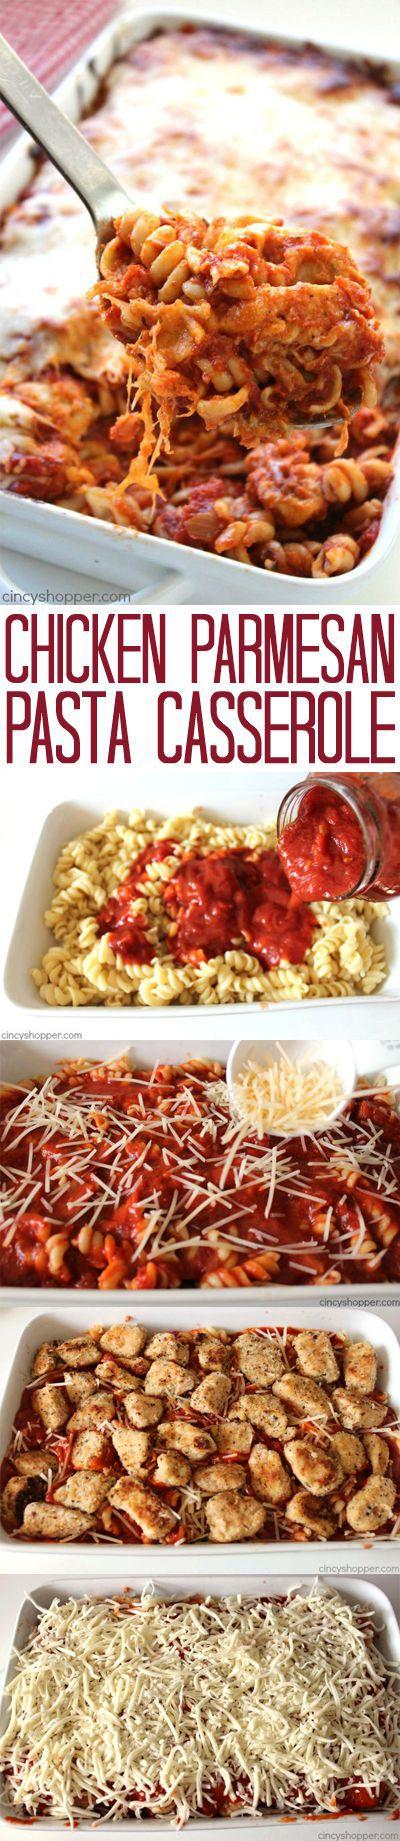 Best 20 Garlic Parmesan Pasta Ideas On Pinterest Parmesan Pasta Garlic Parmesan Sauce And Easy Pasta Sauce